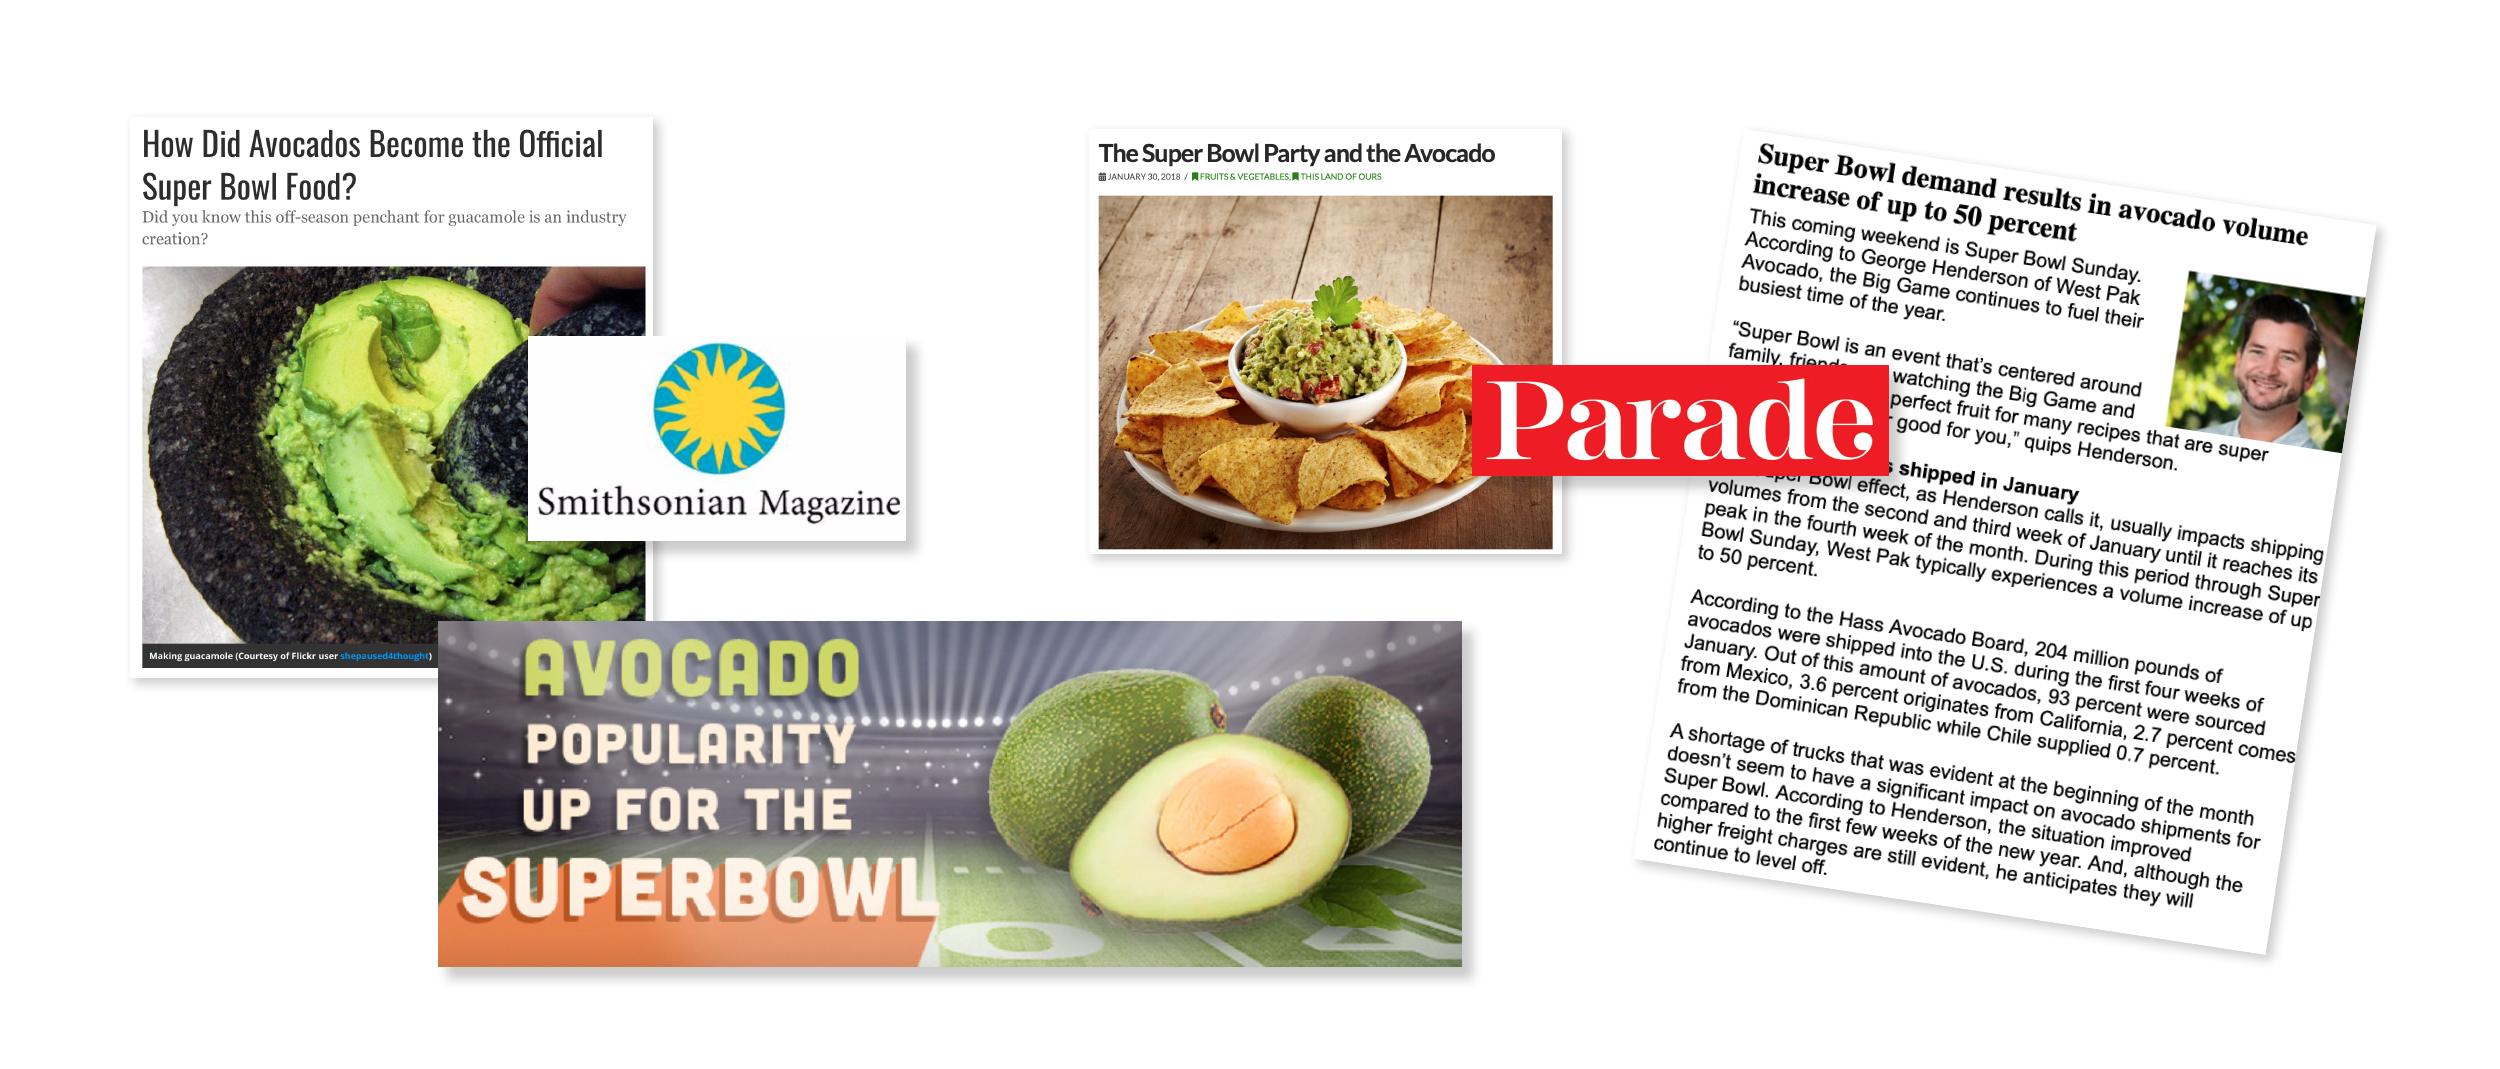 Digital/Print Coverage